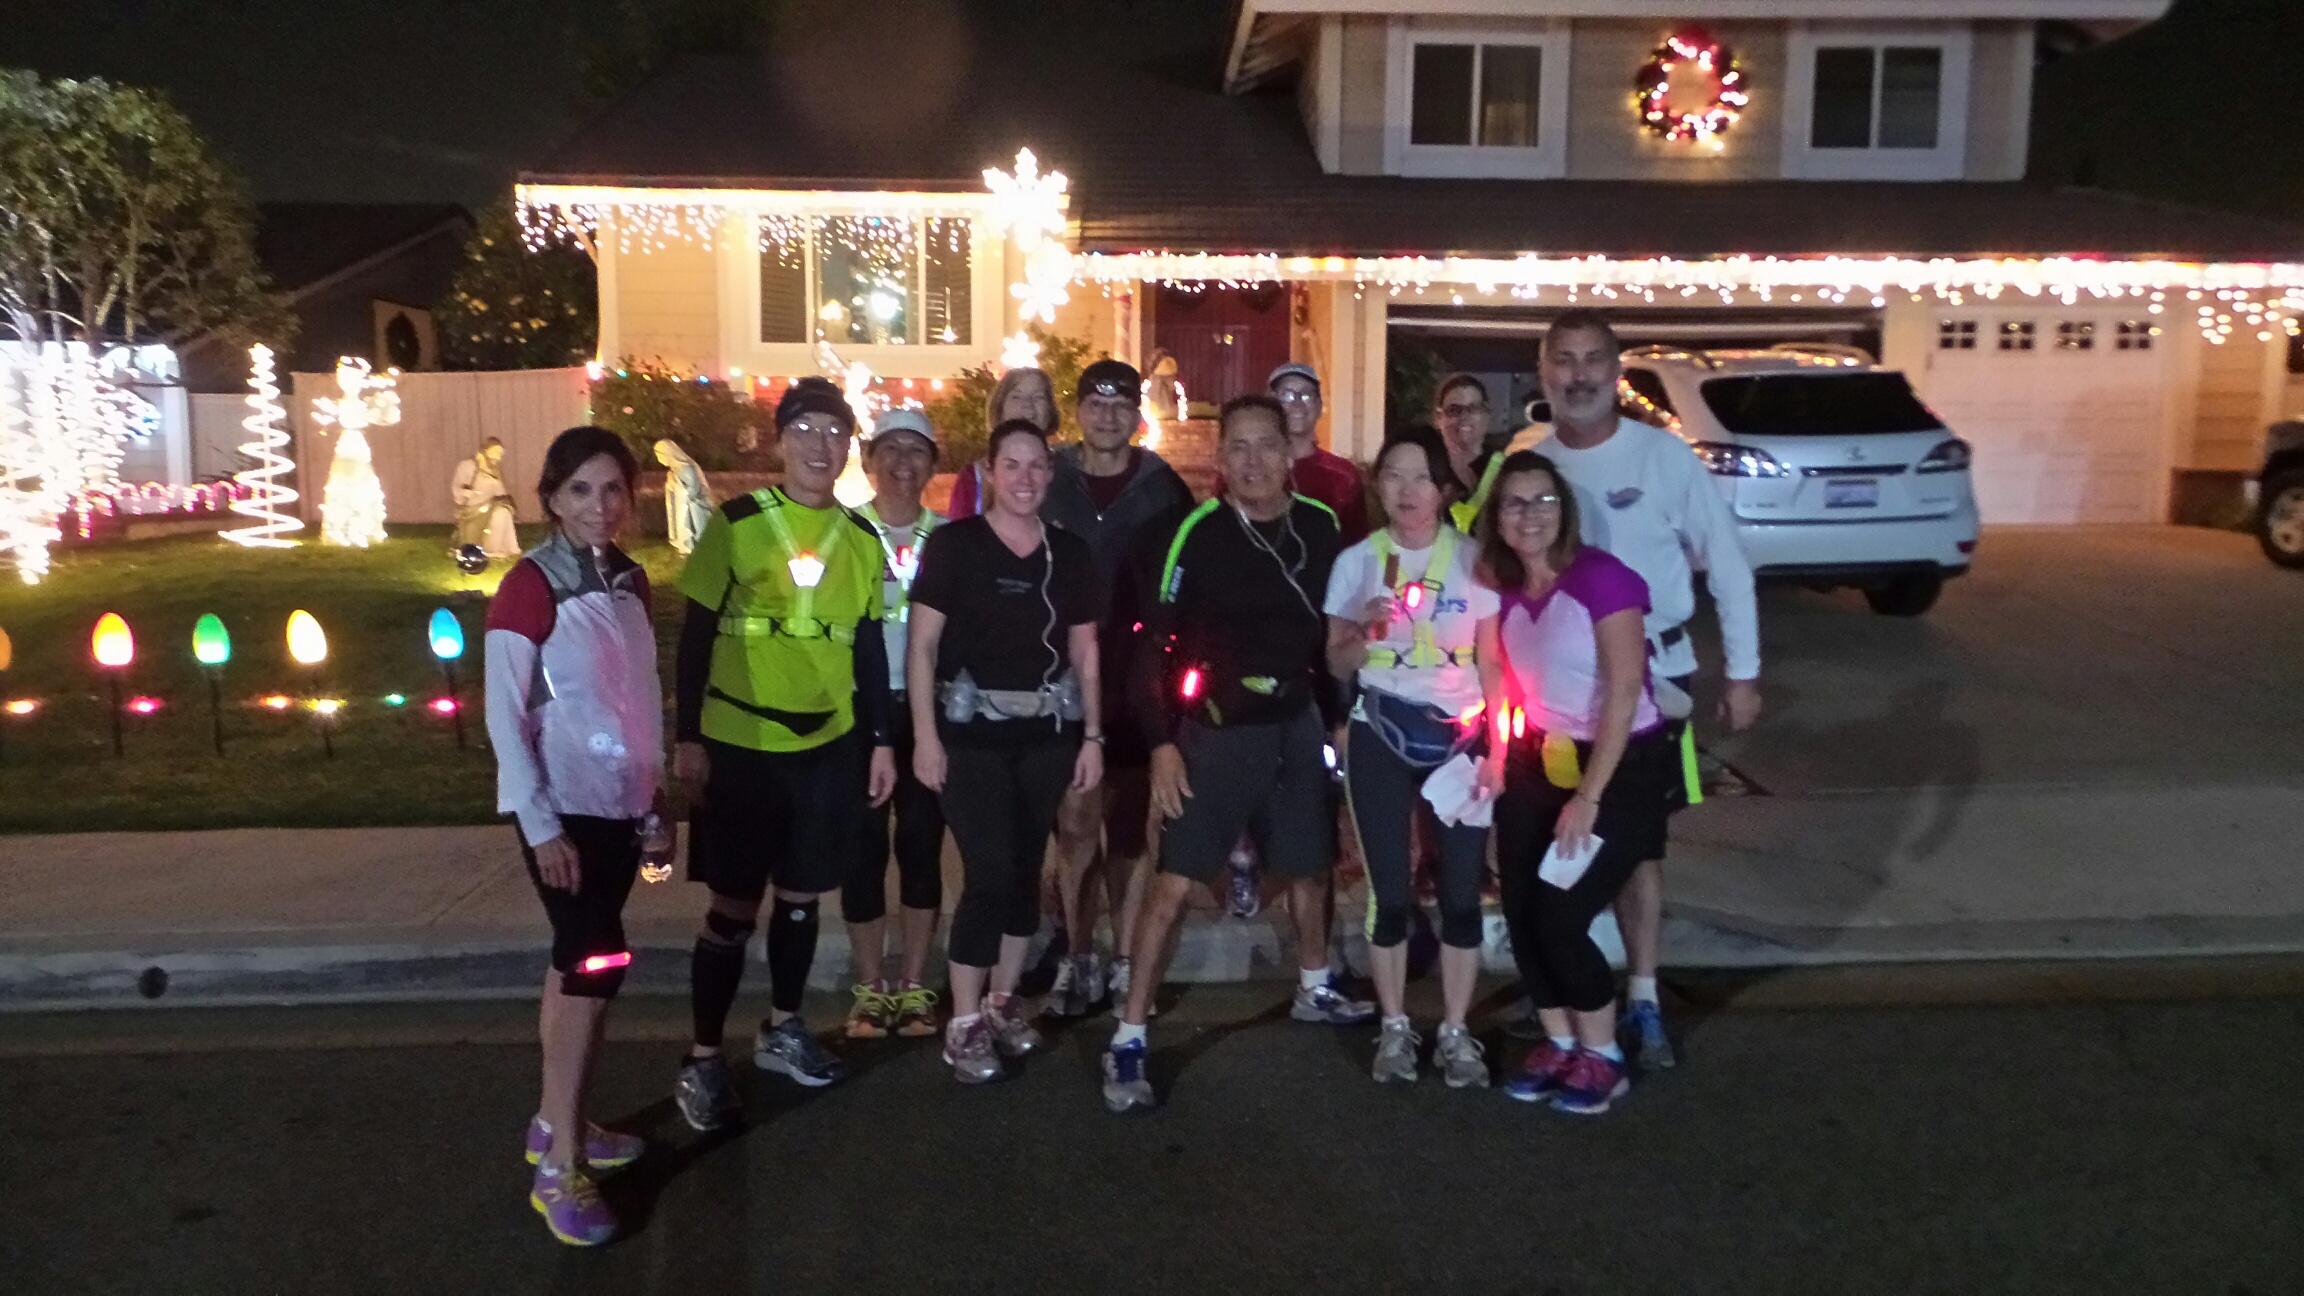 Brea Christmas Lights.Eagle Hills Brea Christmas Lights Run December 2014